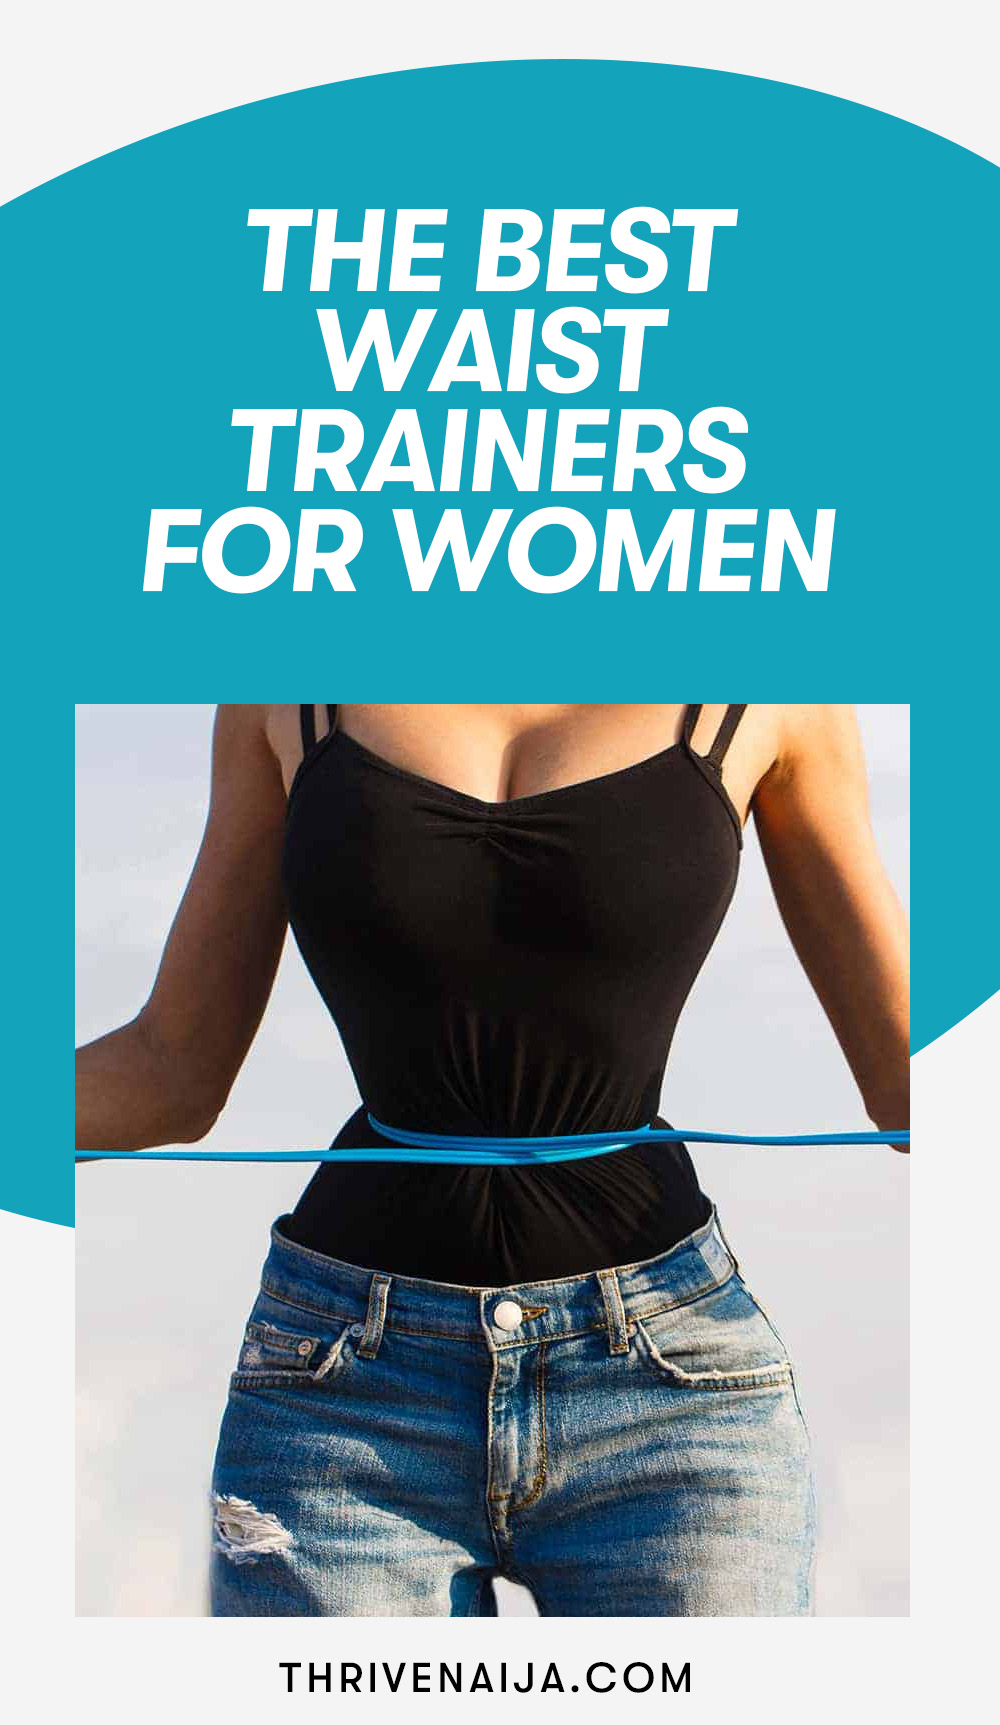 7 Best Waist Trainers For Women